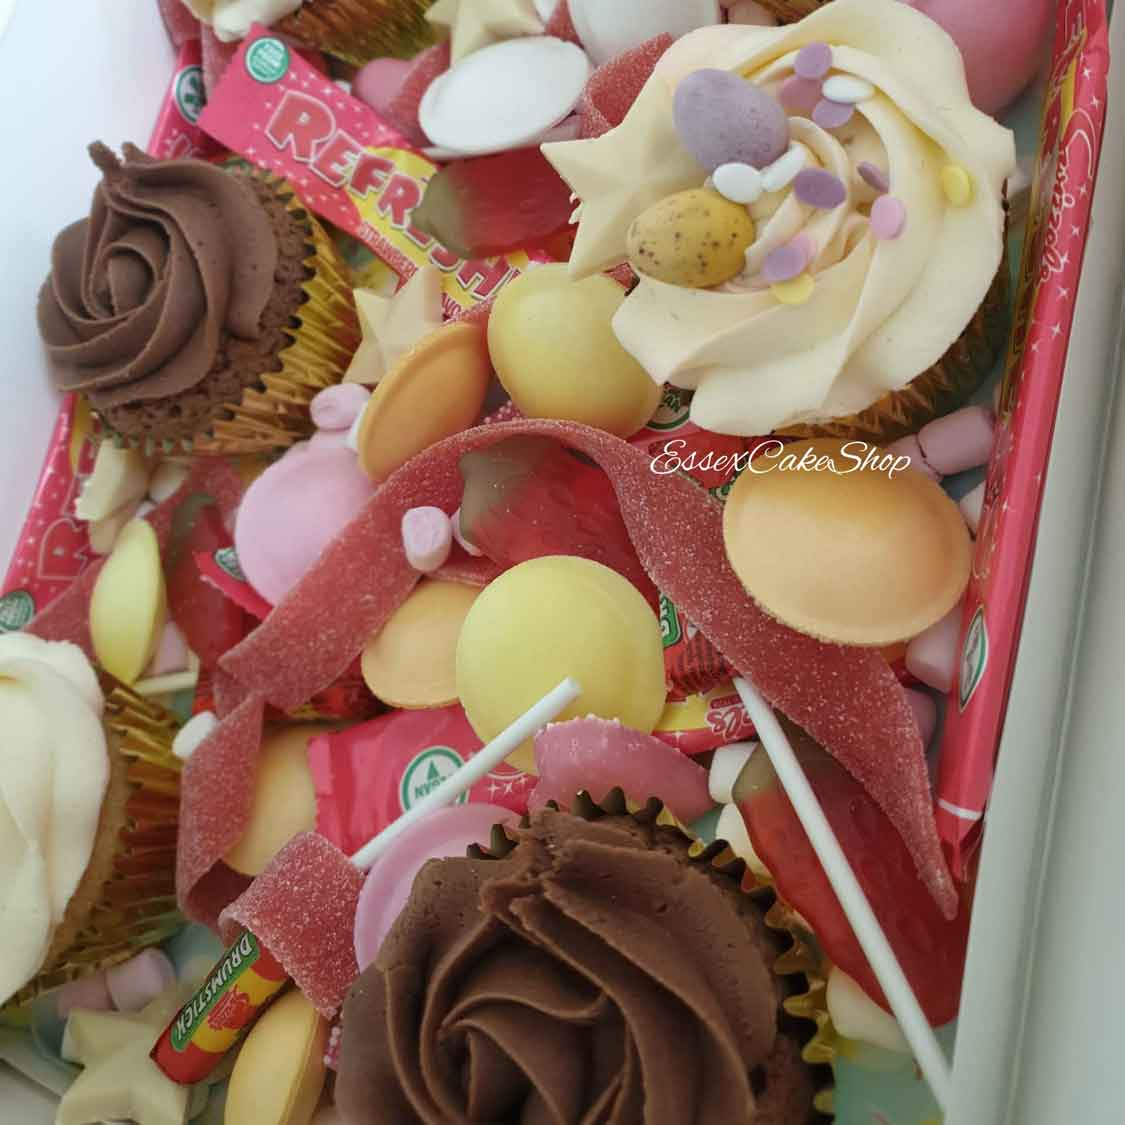 custom cakes essex events essex cake shop